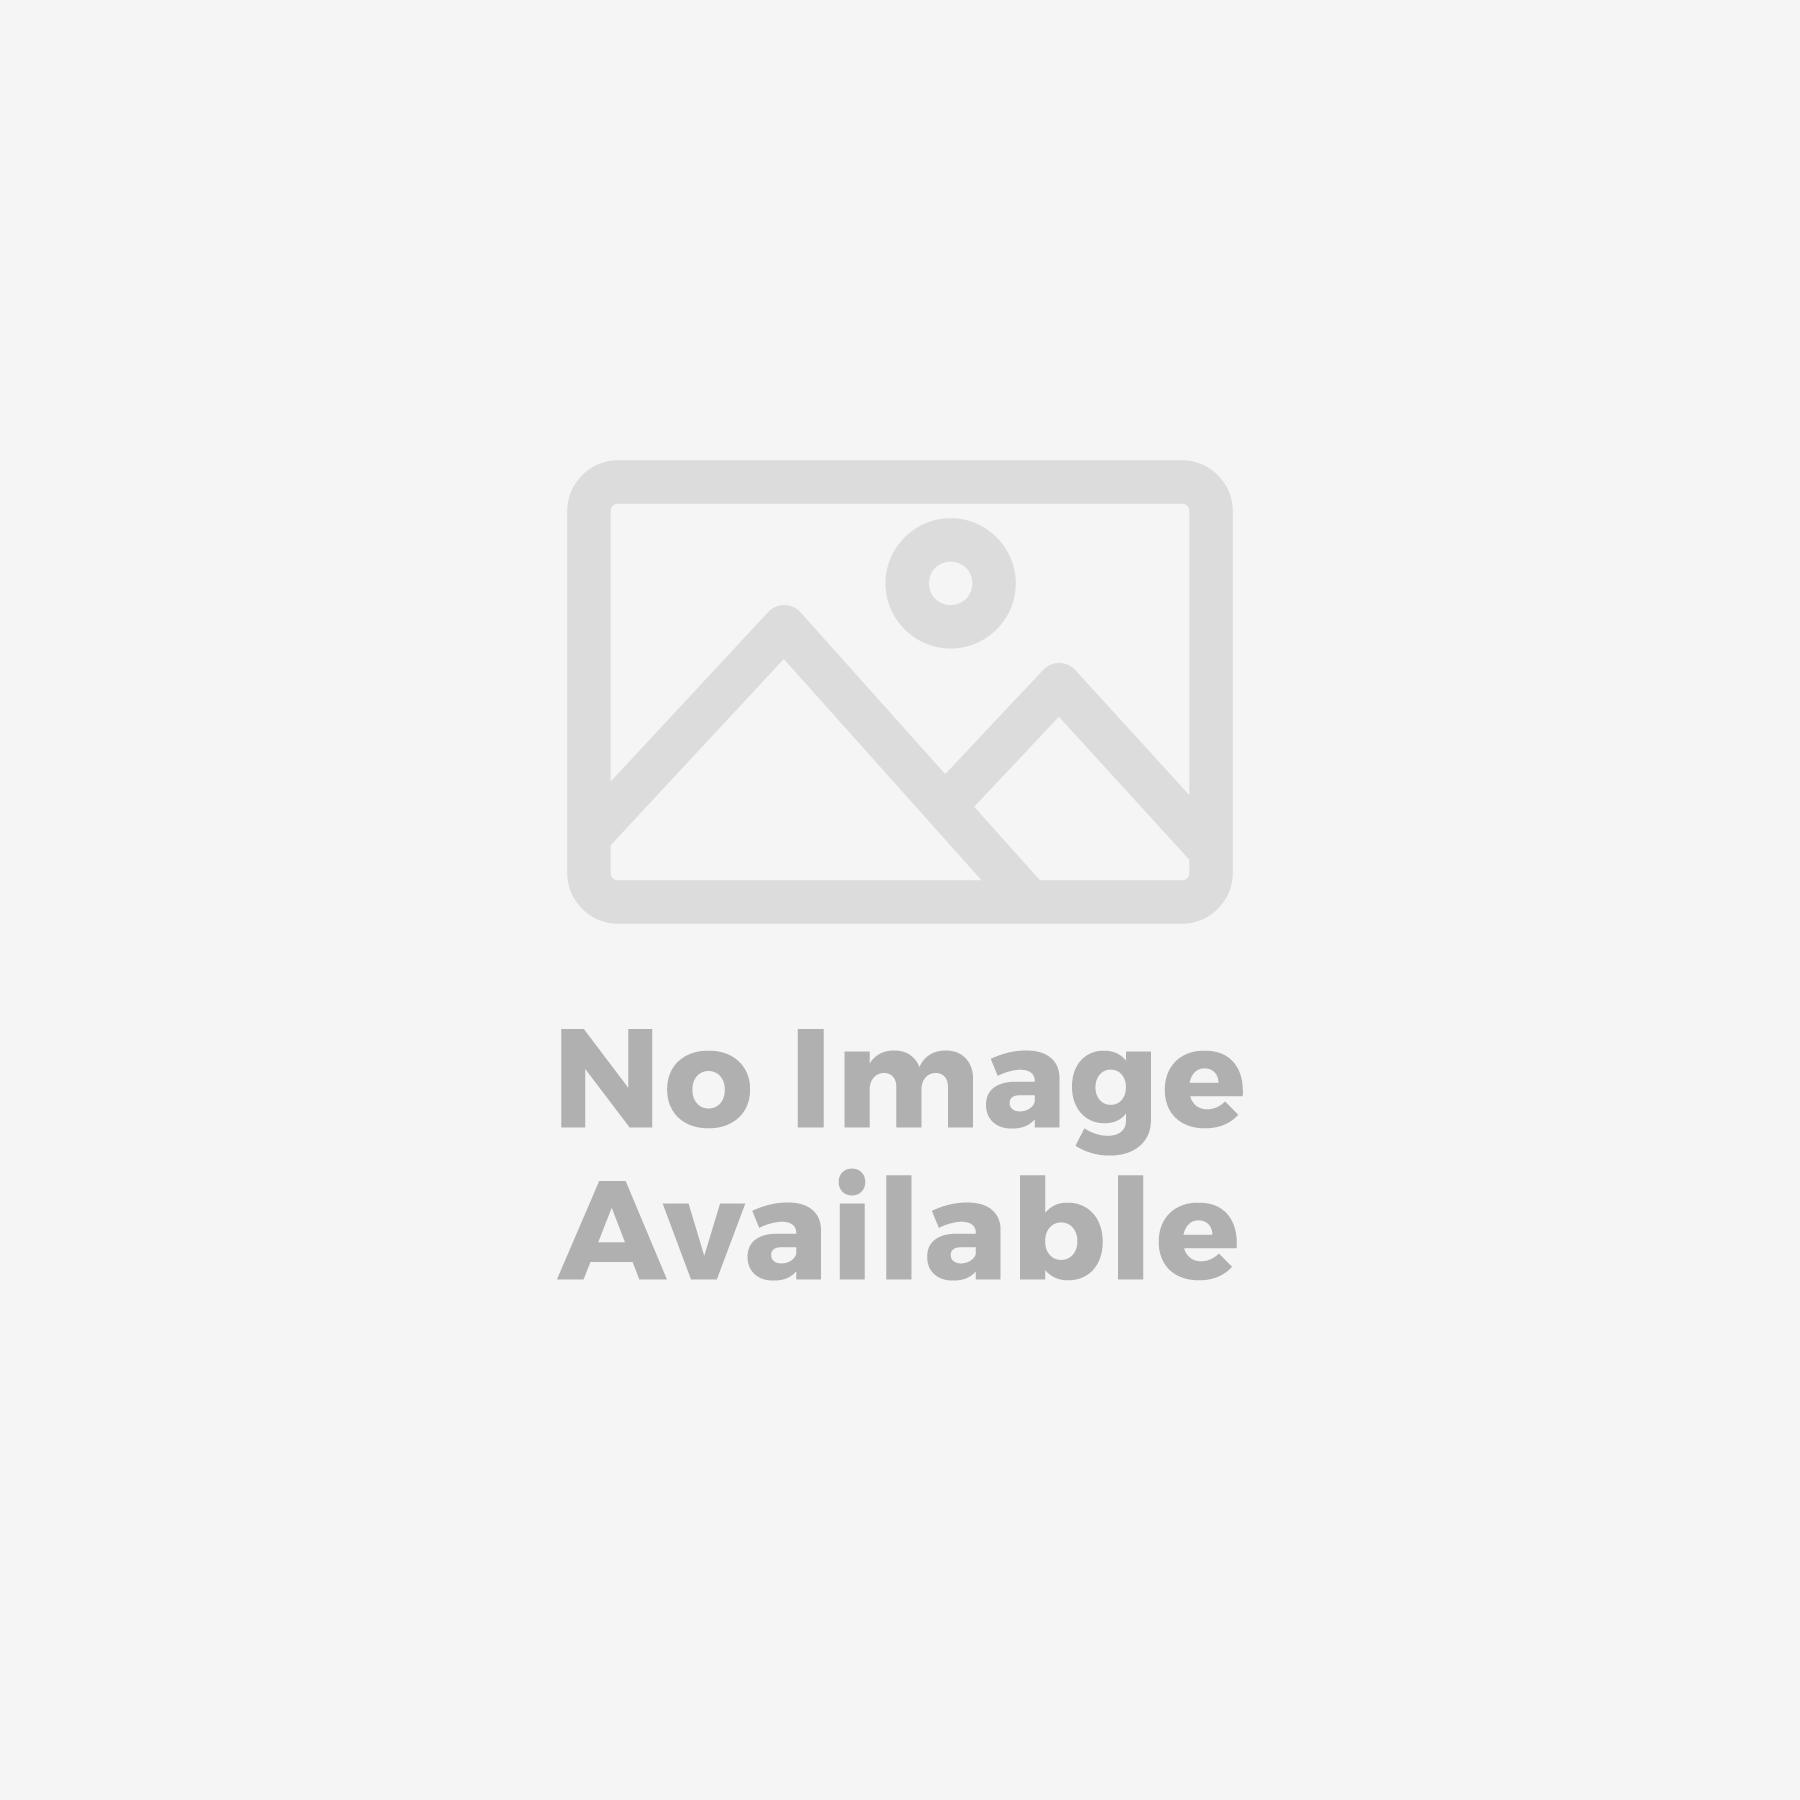 TELLUS Right Arm Chaise Lounge  sc 1 st  Saccaro USA : right arm chaise lounge - Sectionals, Sofas & Couches